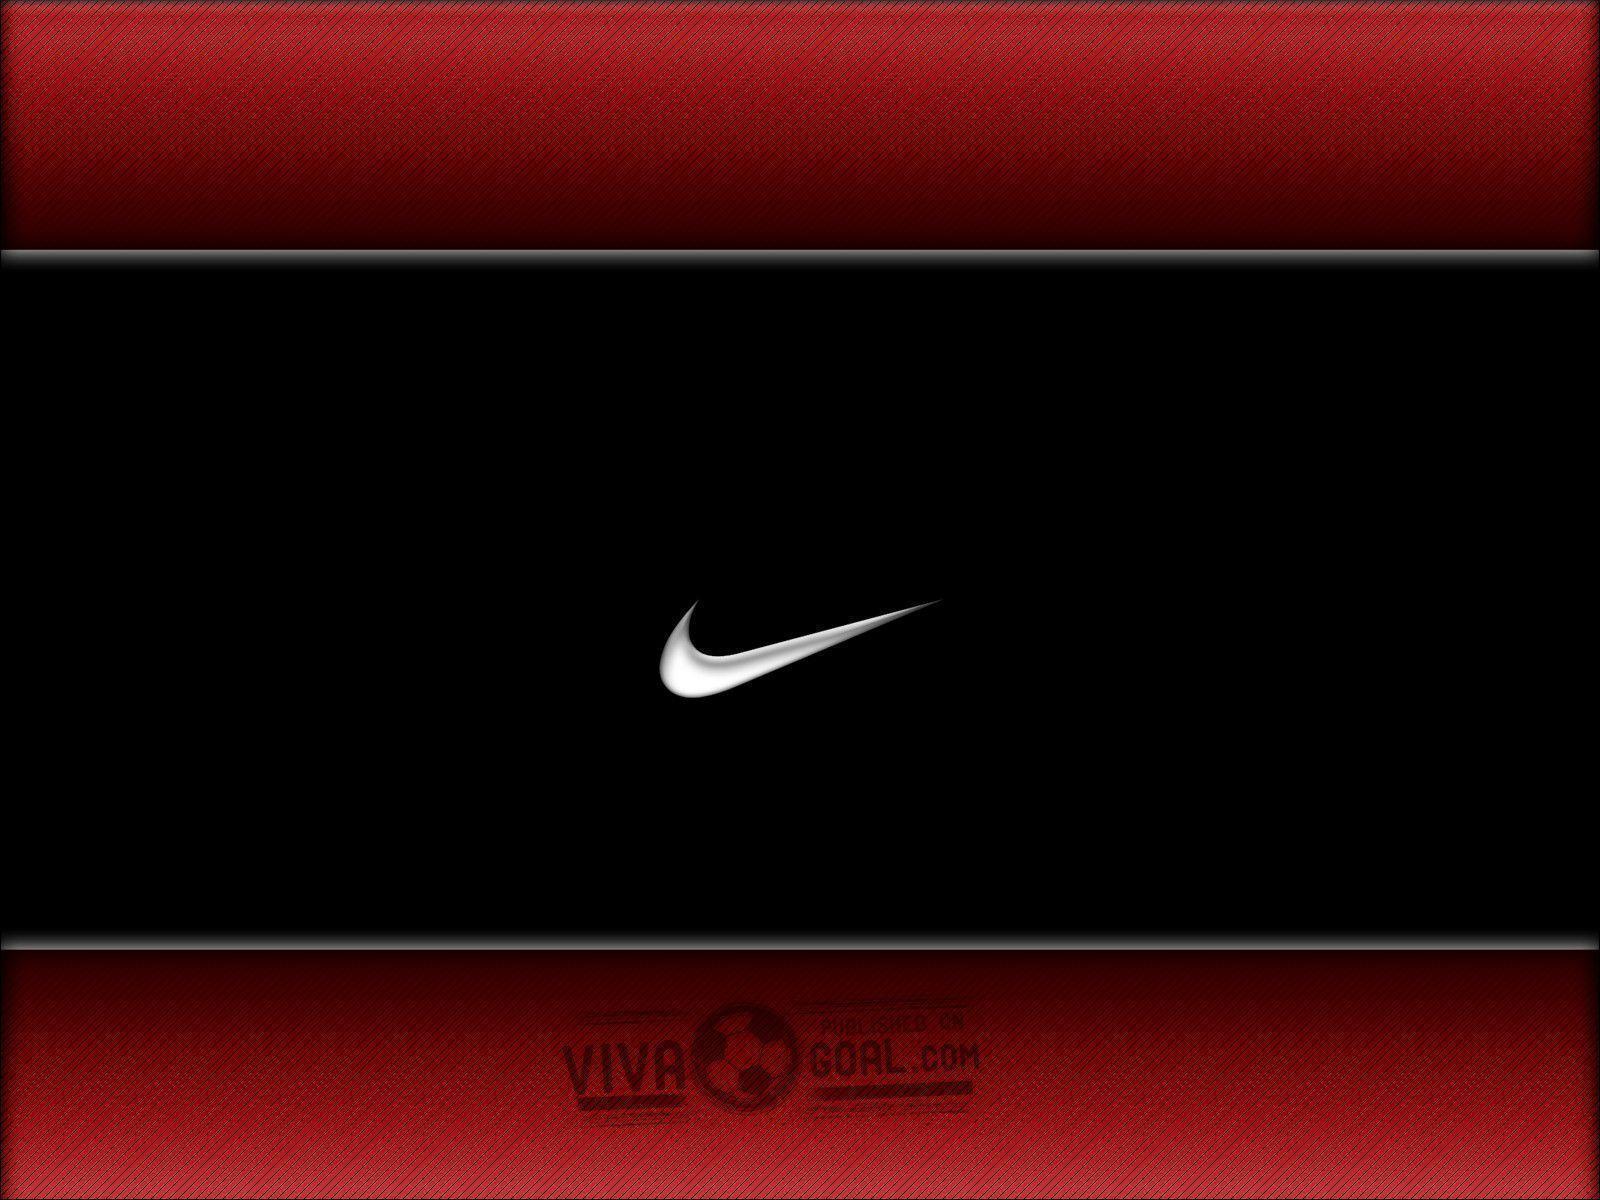 Nike Wallpaper Download | Black Wallpapers For Desktop